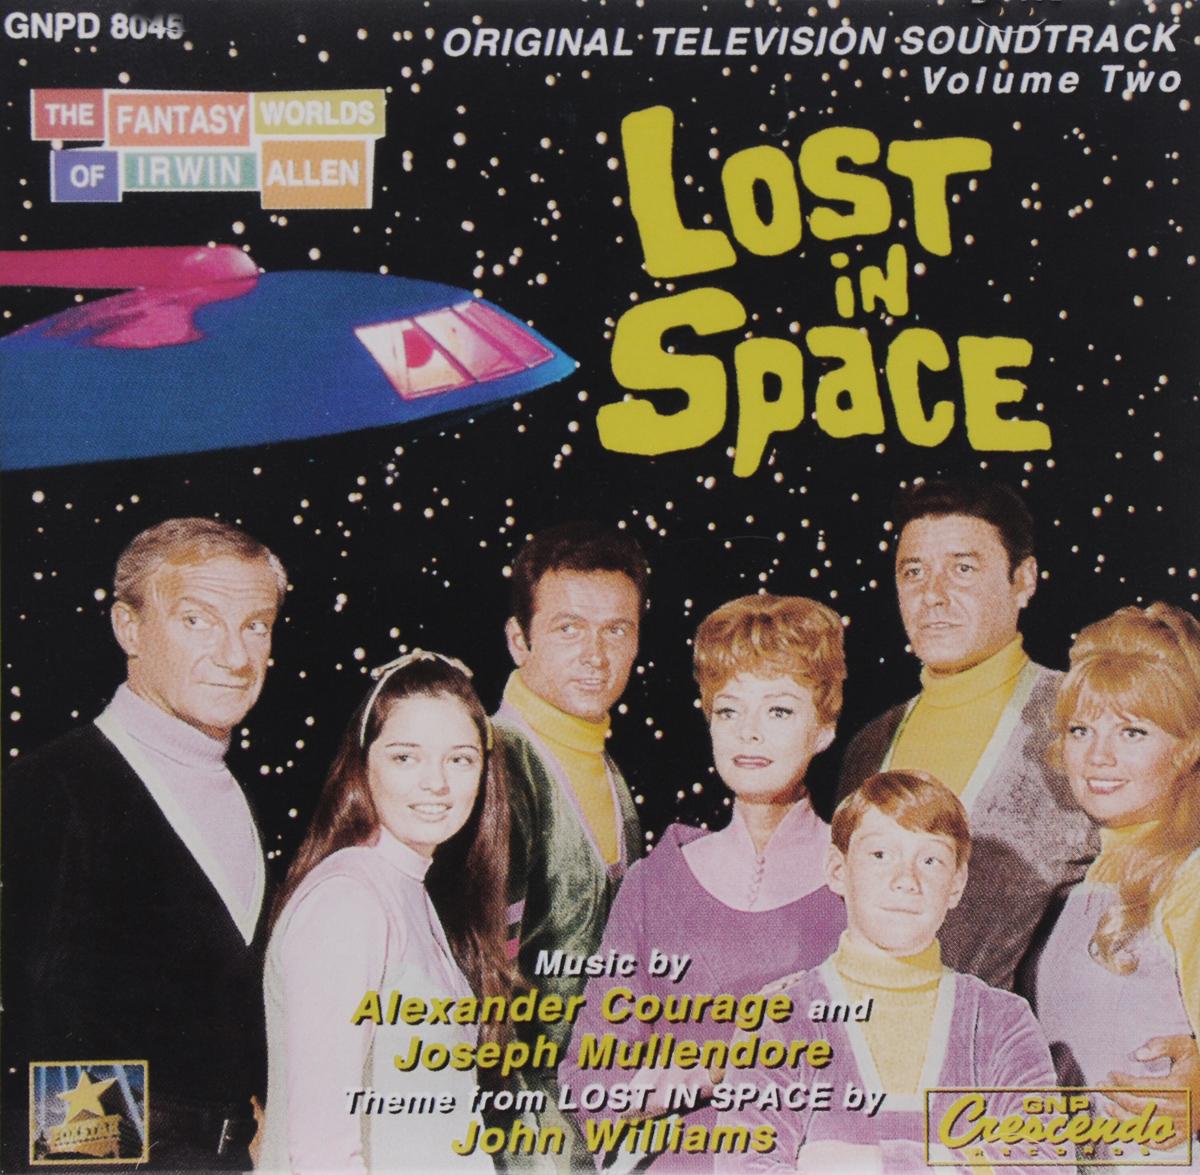 The Fantasy Worlds Of Irwin Allen. Vol. 2. Lost In Space. Original Television Soundtrack. Vol. 2